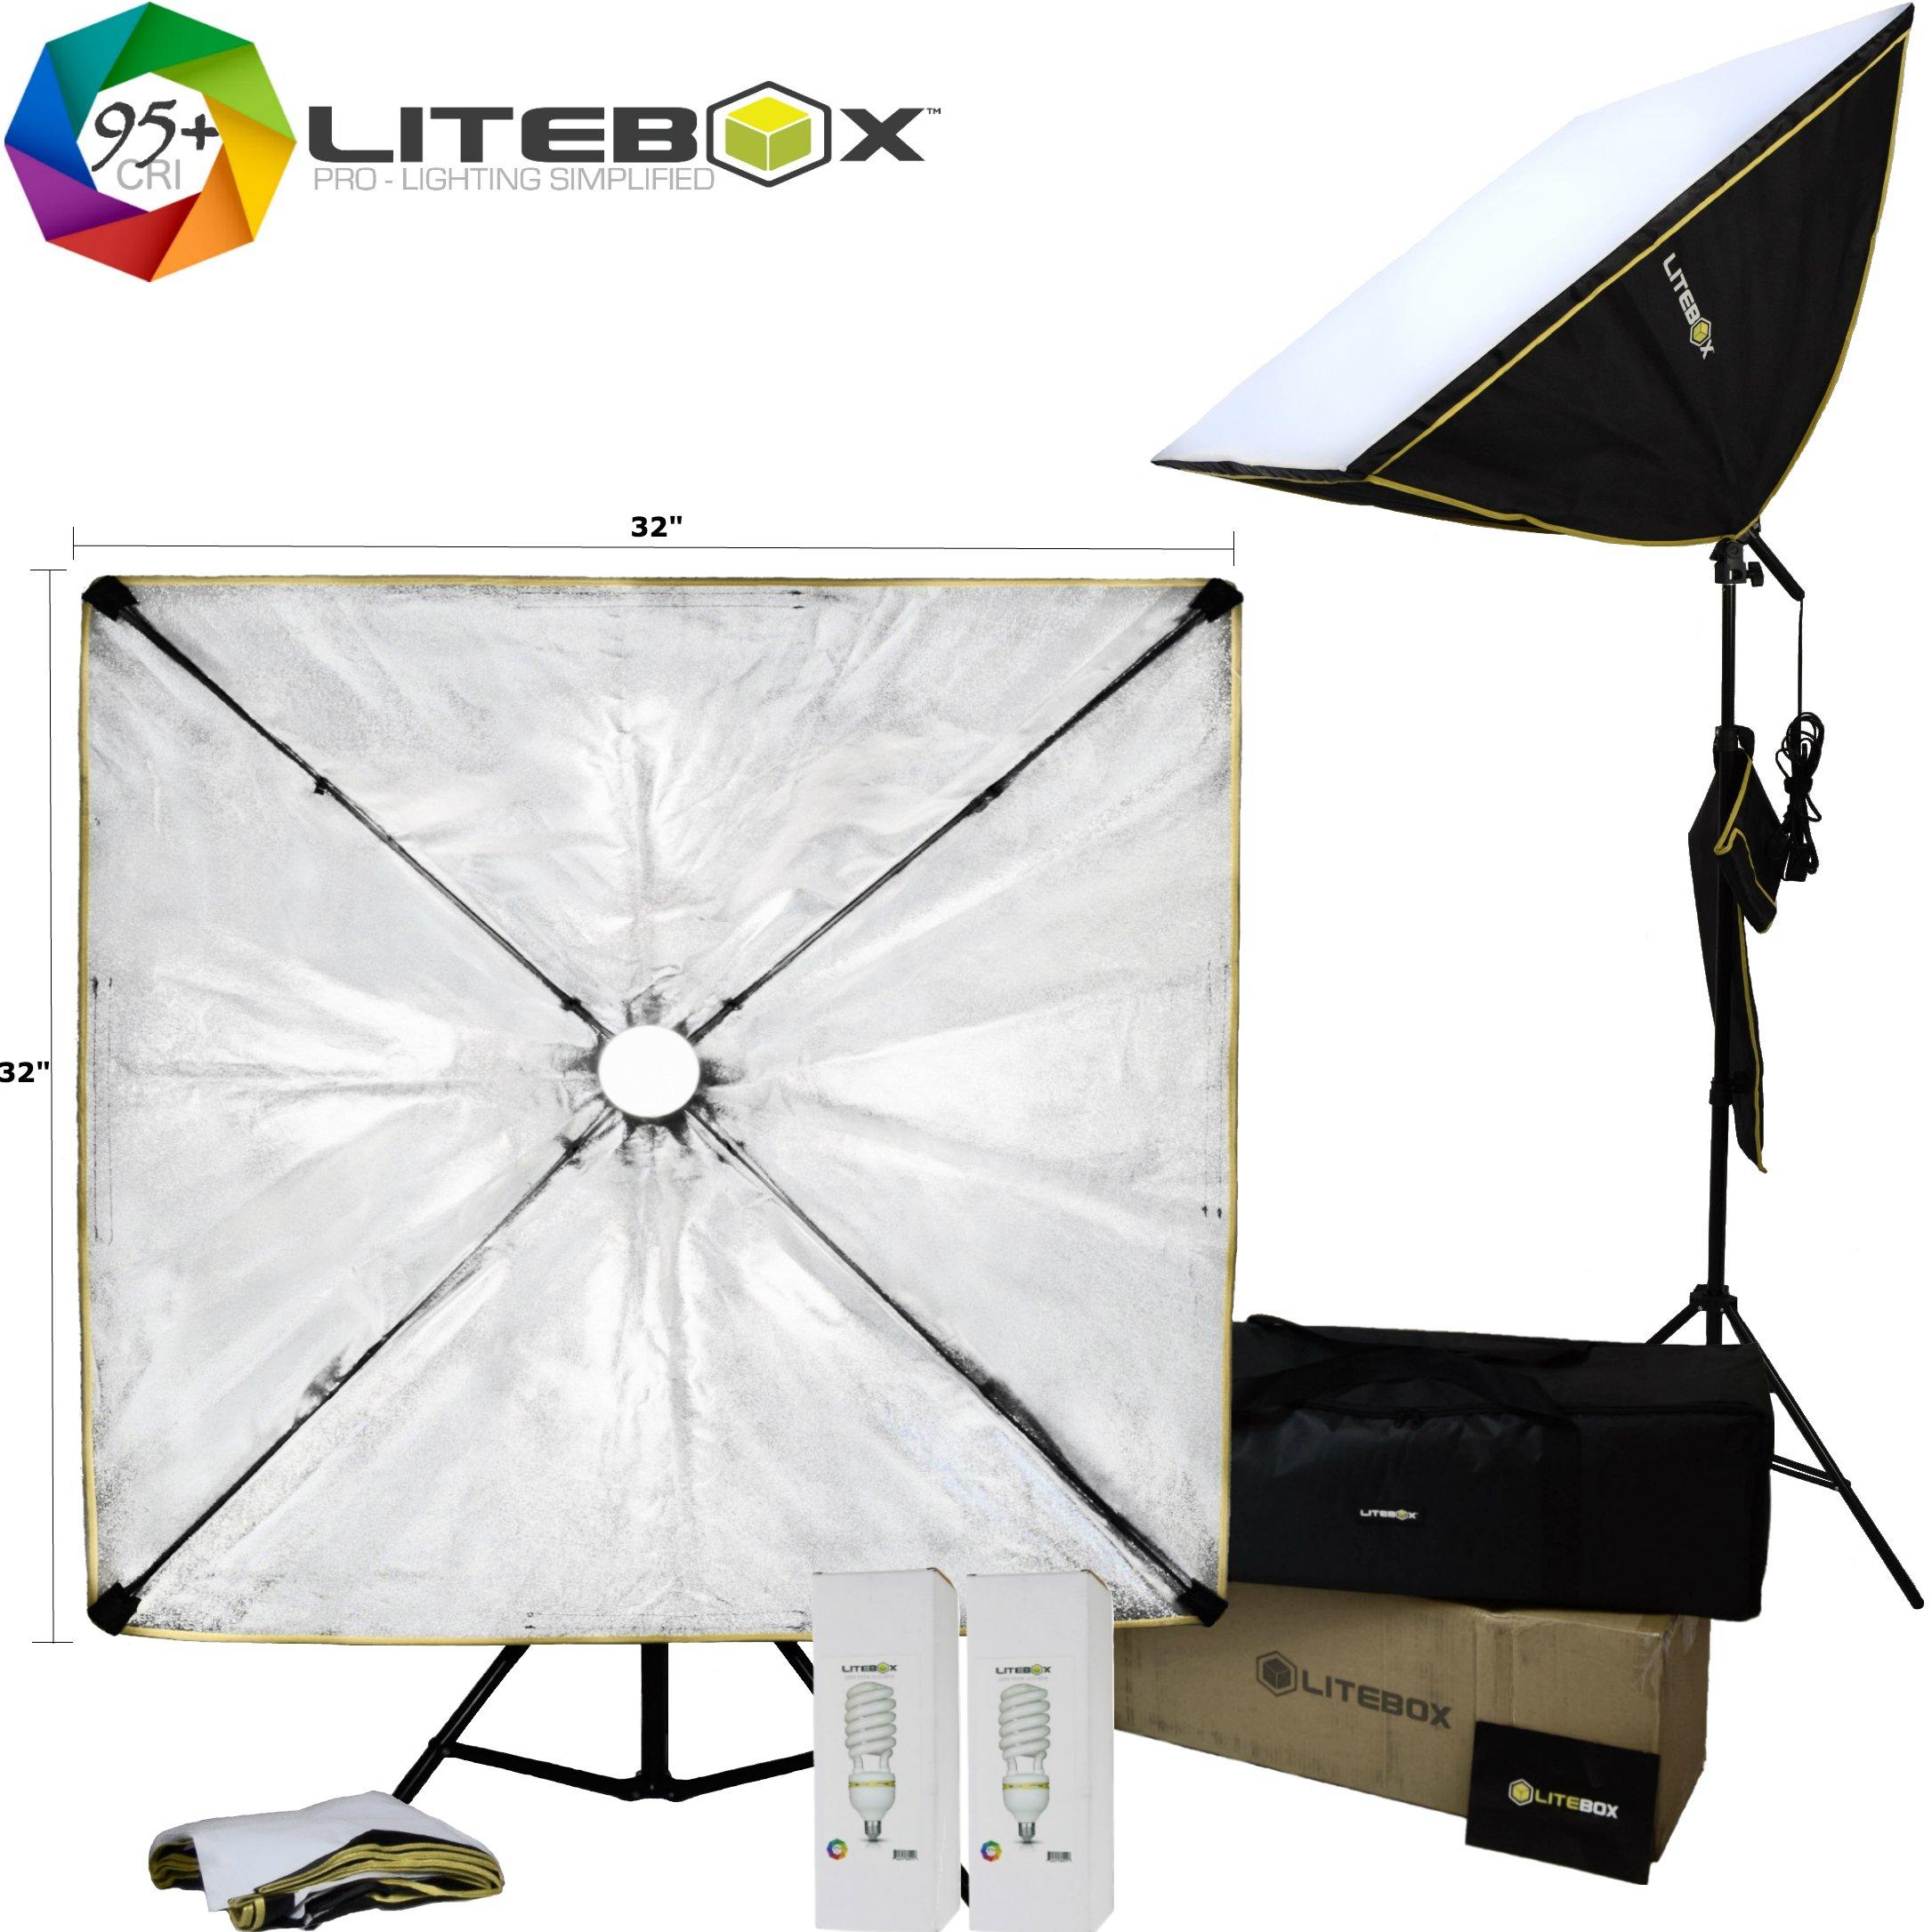 LITEBOX | 32'' x 32'' Large Photography Softbox Lighting Kit - Professional Photo/Video Bulbs, Stands, Travel Bag - 5500K Daylight